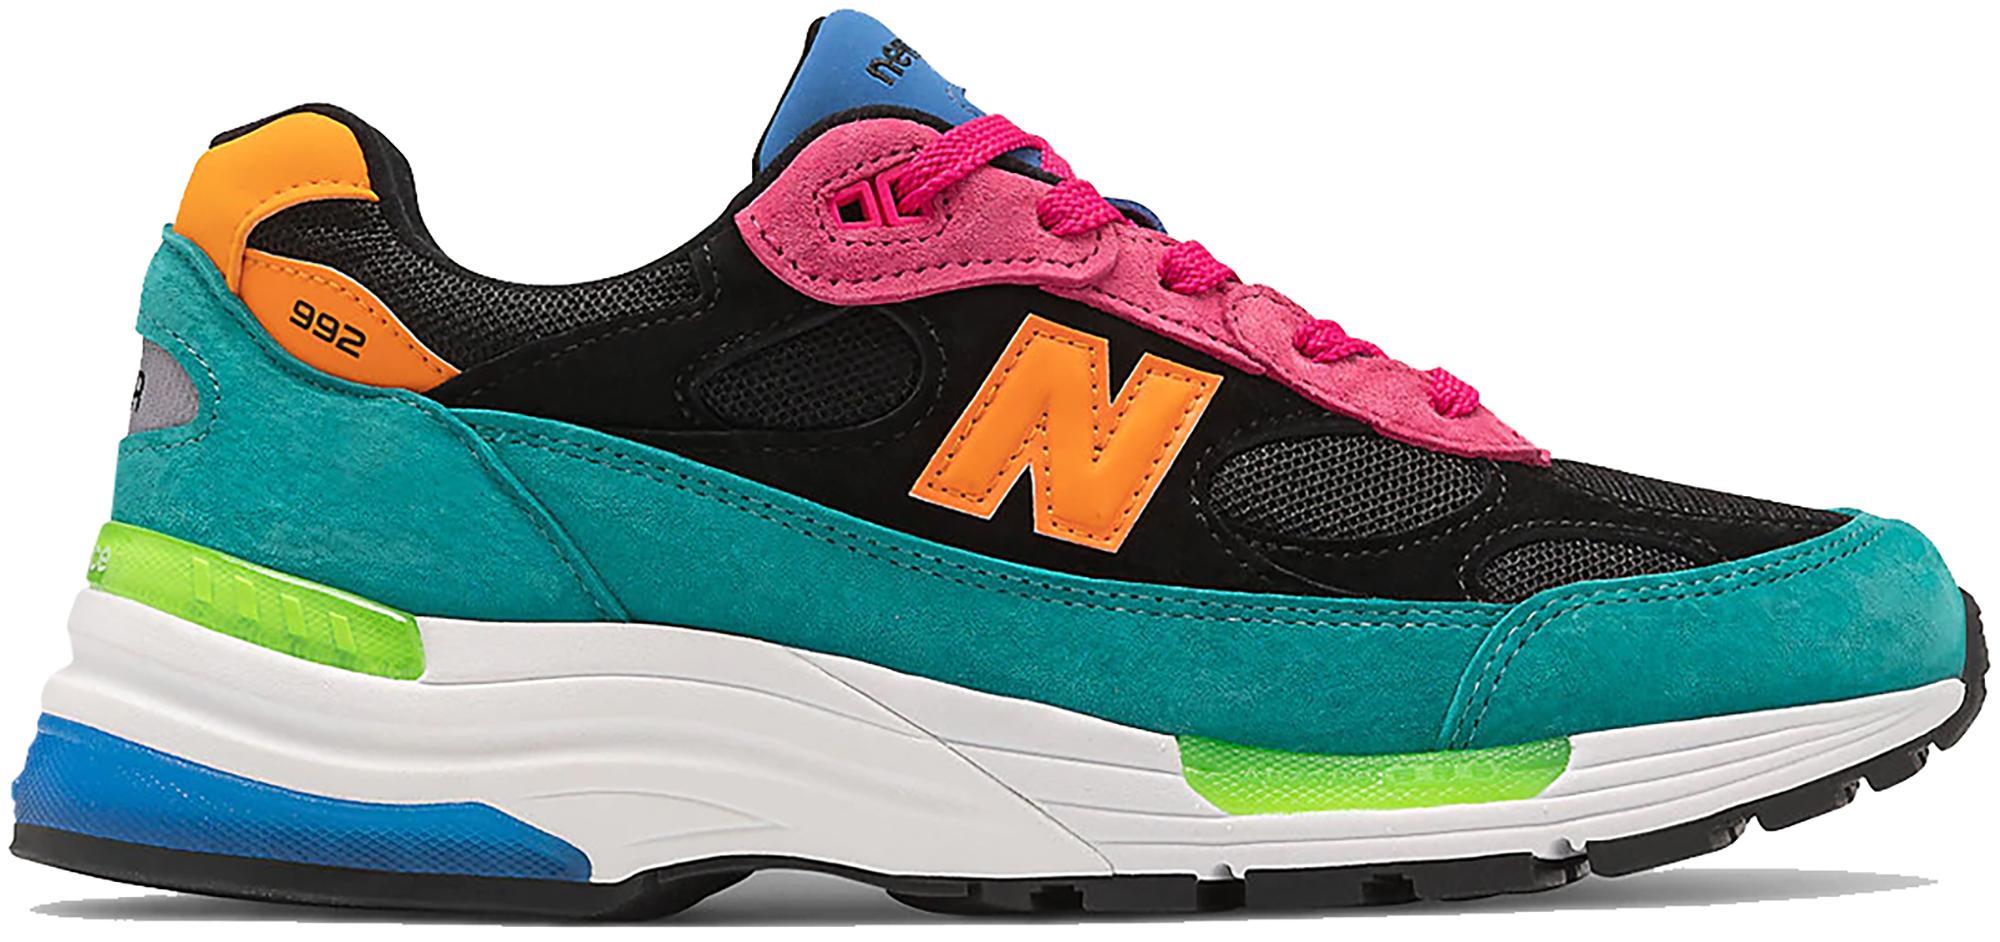 New Balance 992 Black Multi - Sneakers